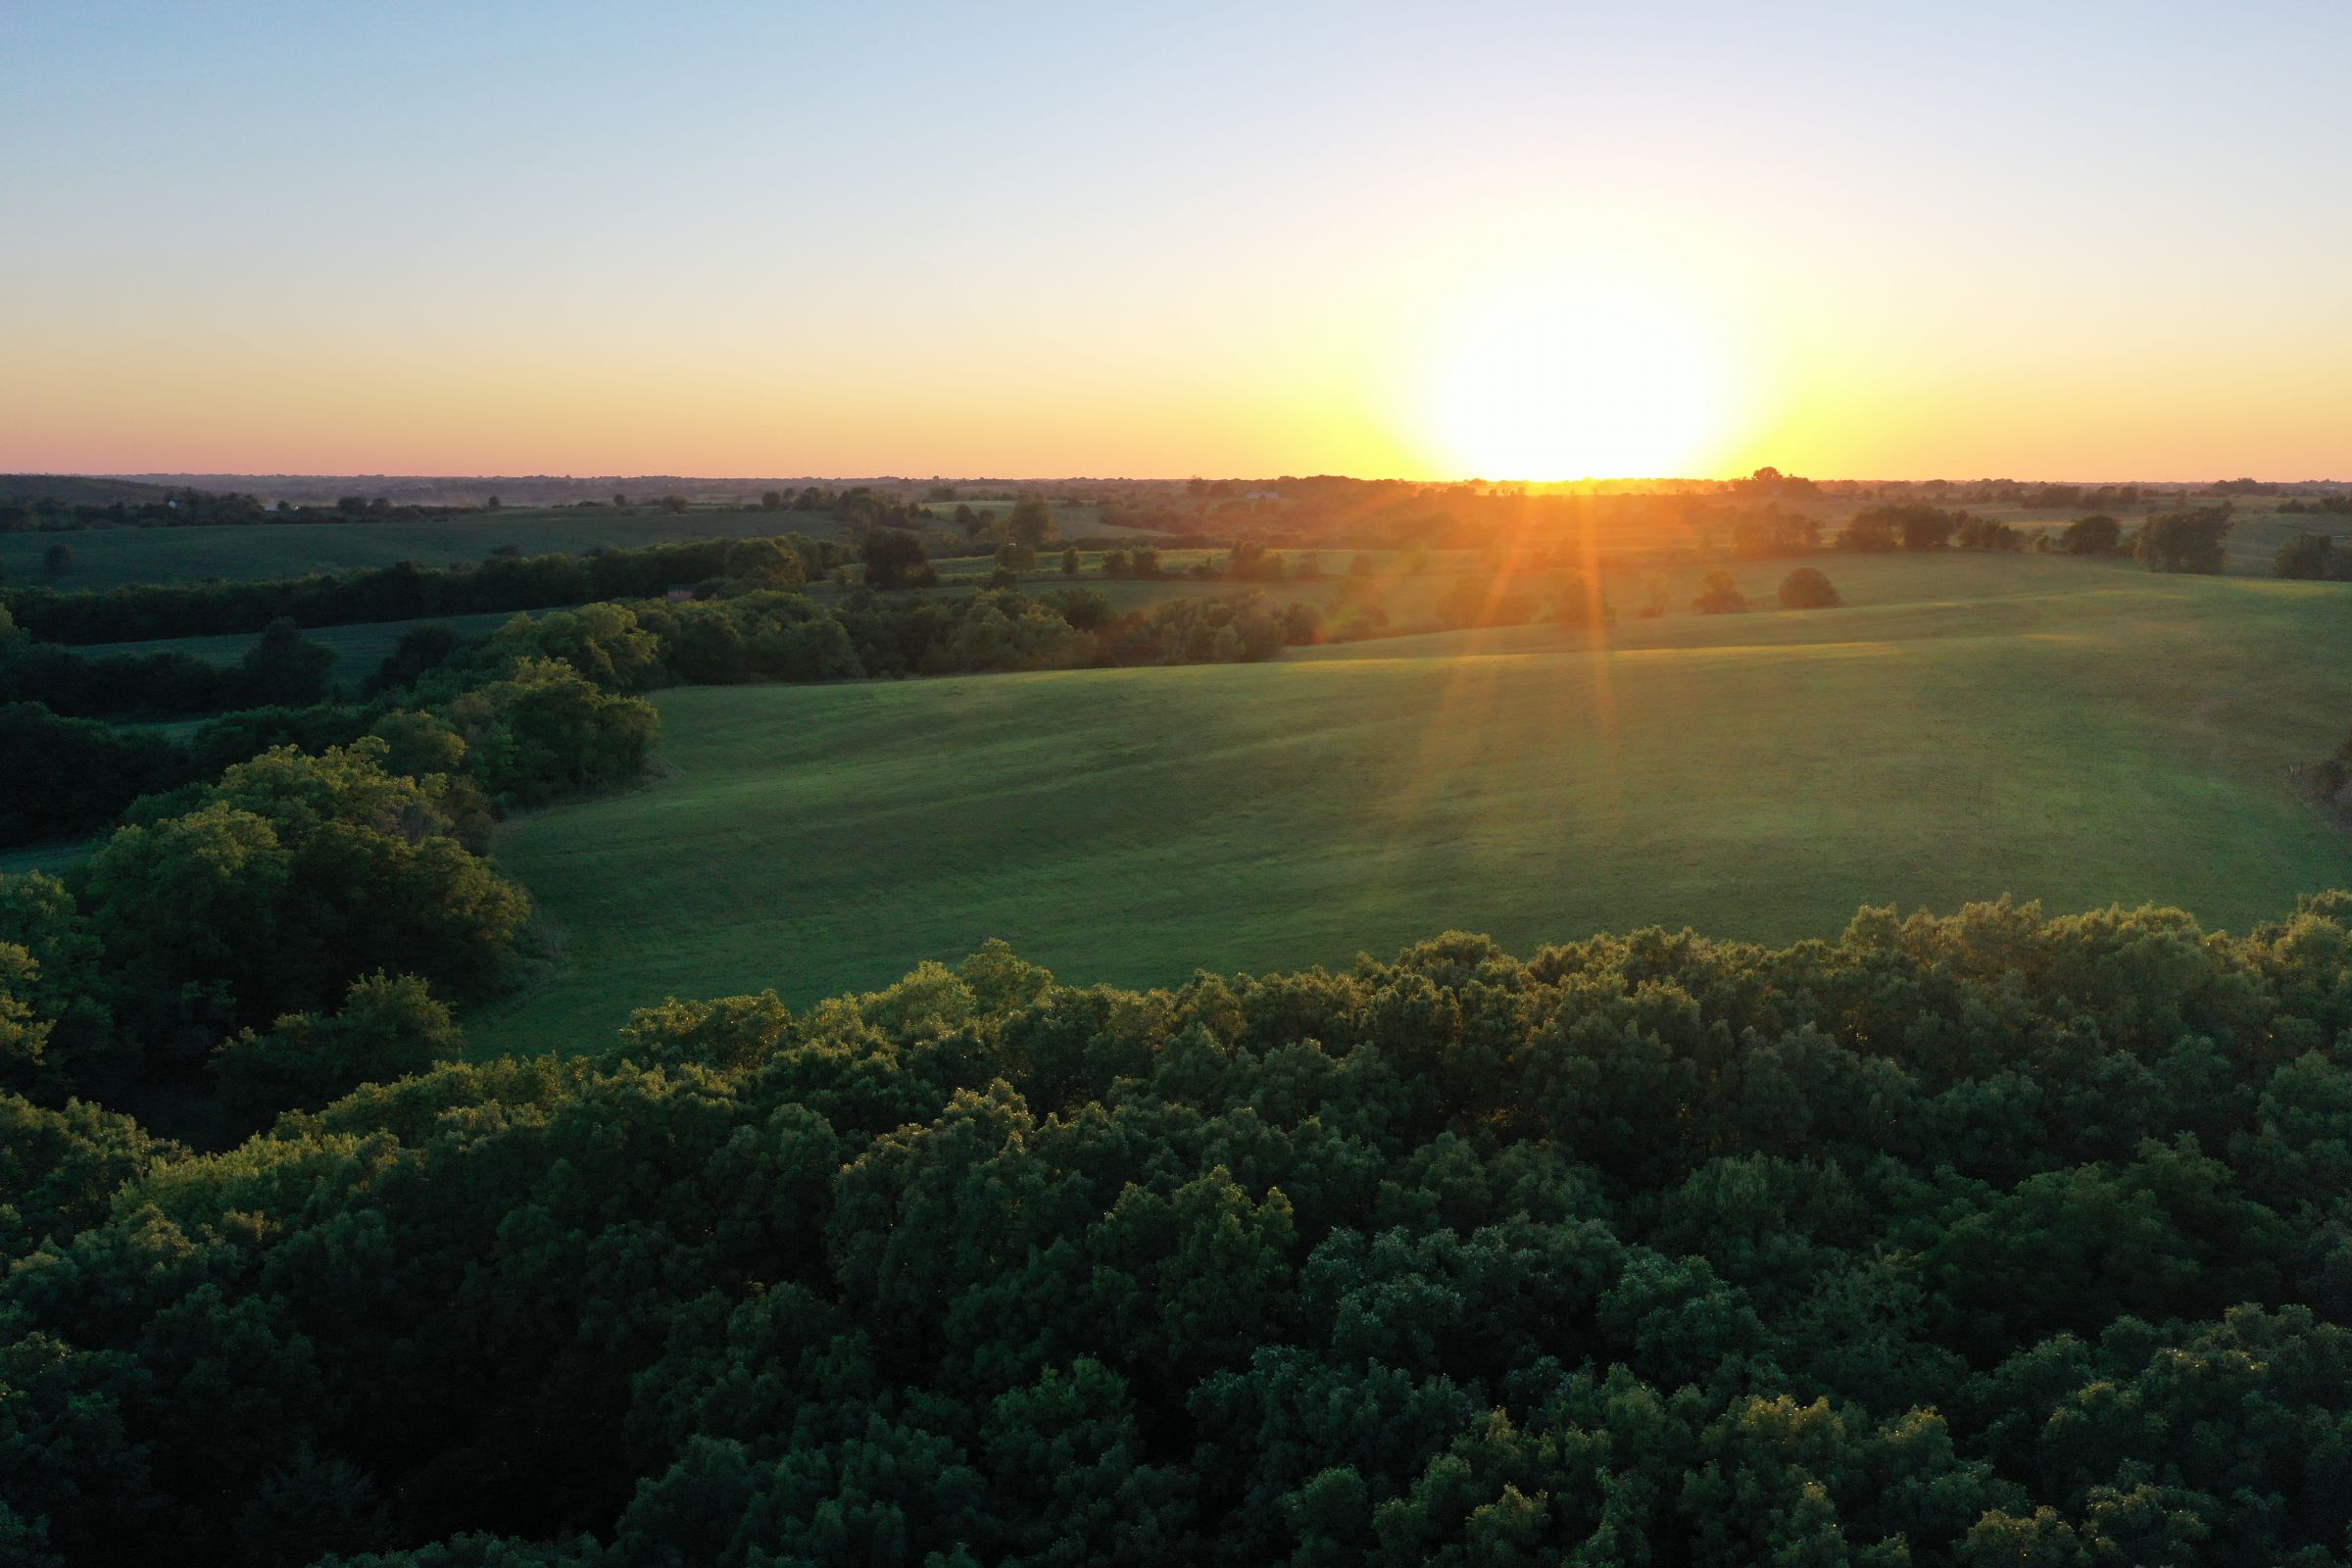 land-clarke-county-iowa-325-acres-listing-number-15416-5-2021-03-18-163319.JPG